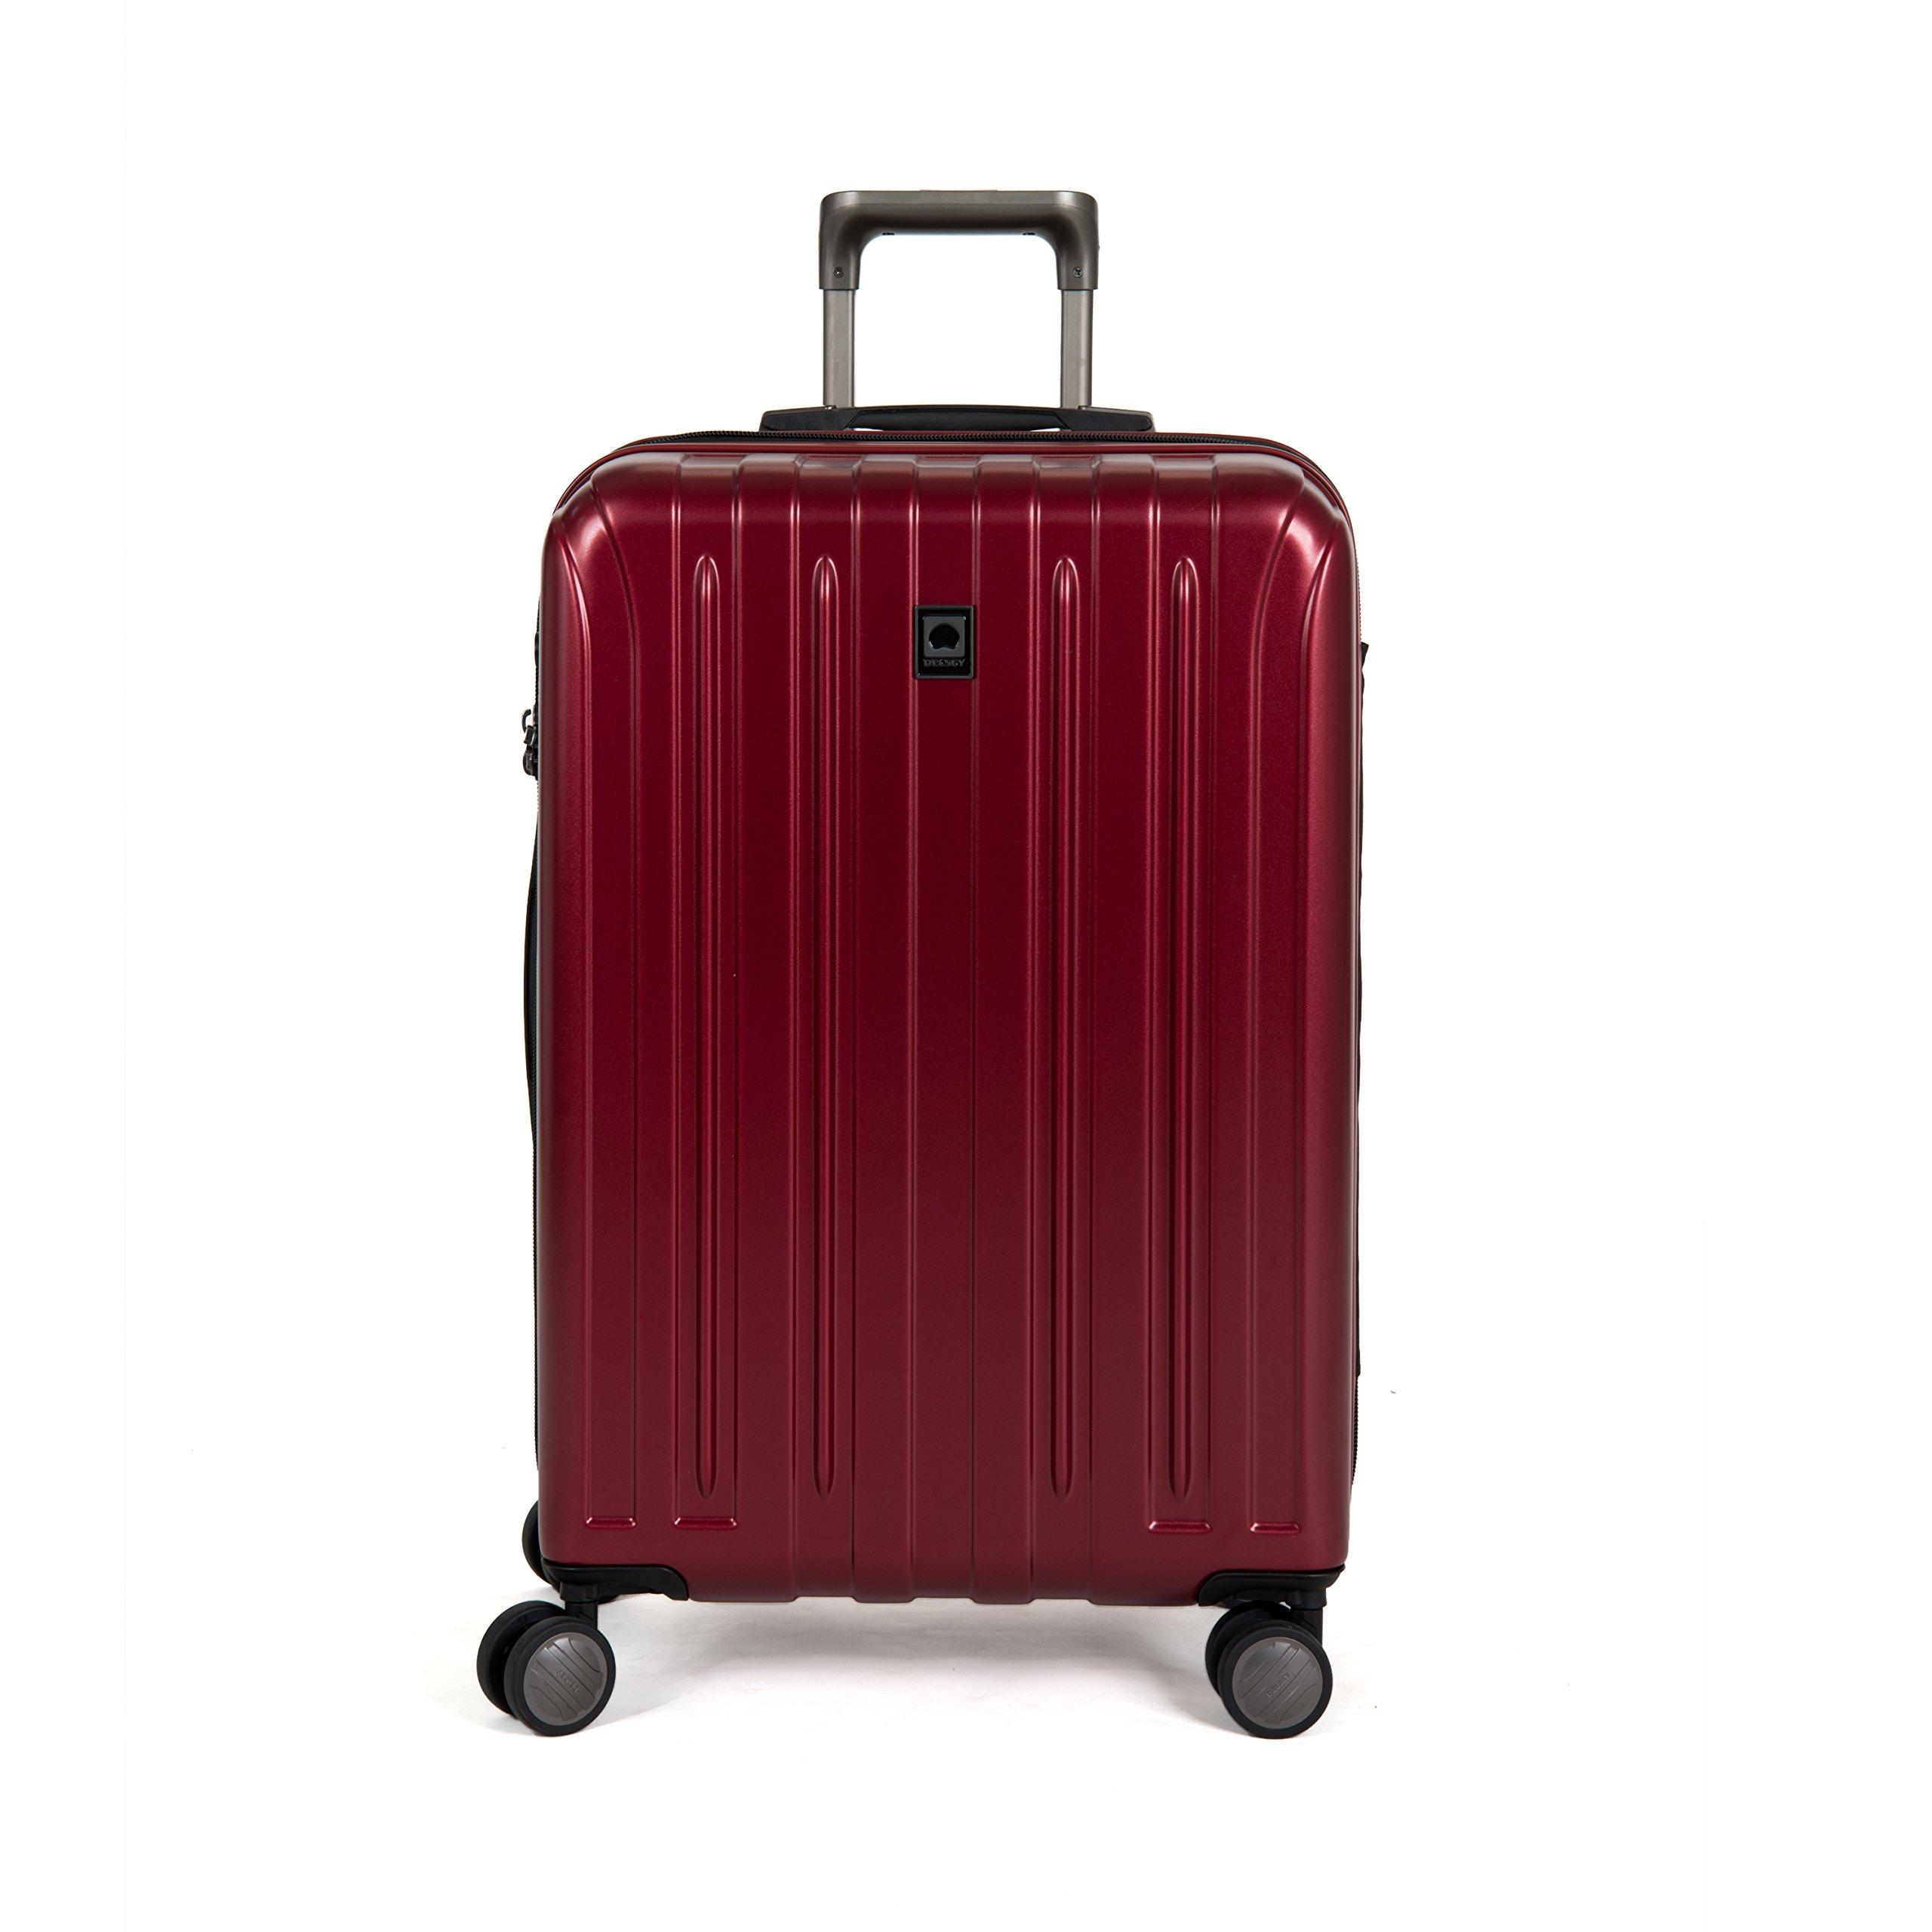 DELSEY Paris Luggage Helium Titanium 25'' Spinner Trolley Hard Case Suitcase, Black Cherry, One Size